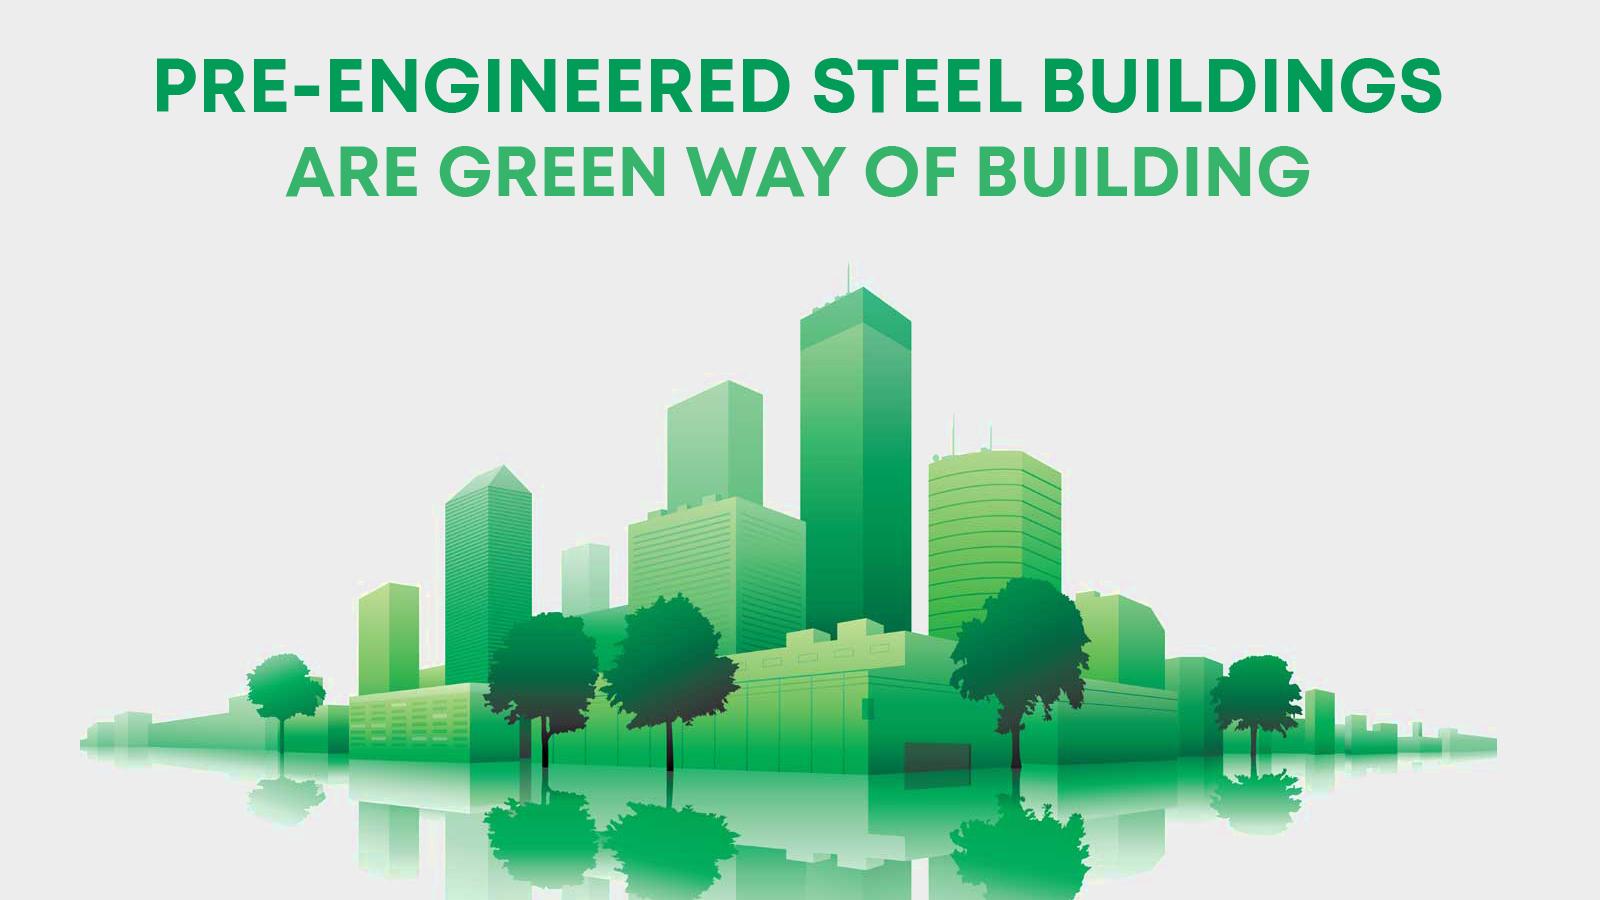 pre-engineered-steel-buildings-are-green-way-of-building